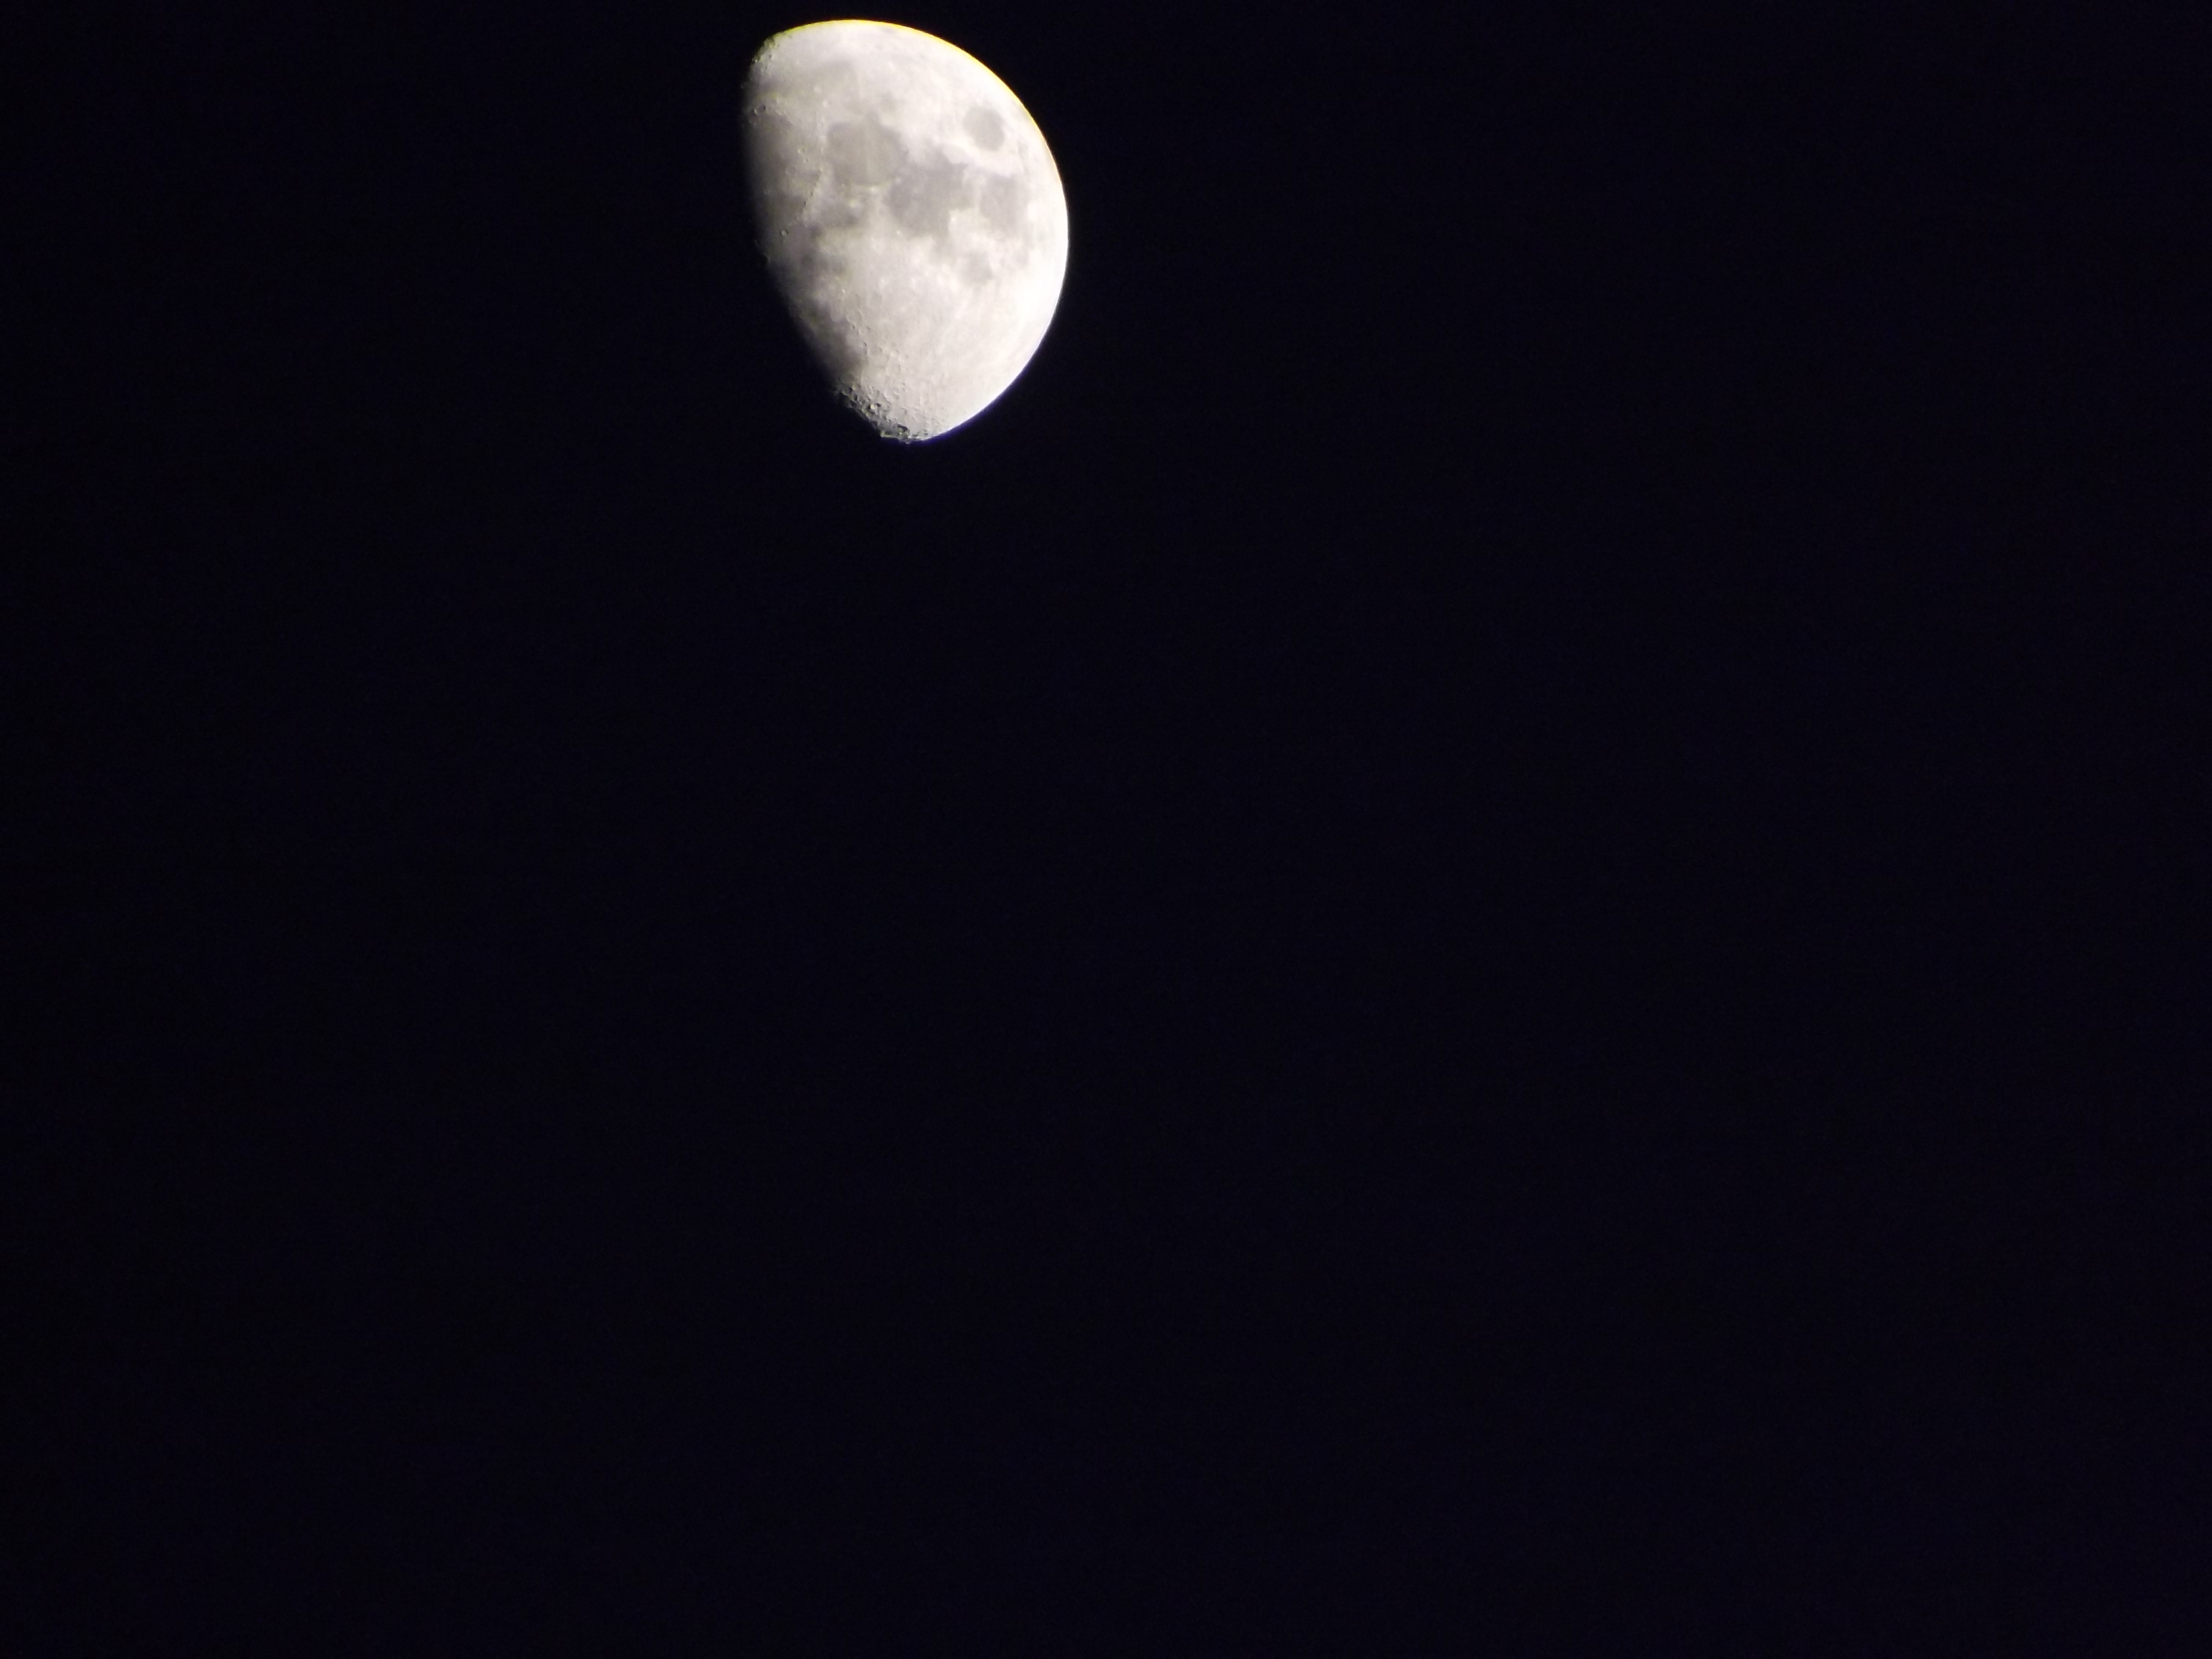 MOON 2015.03.29 20:48 by Apkx